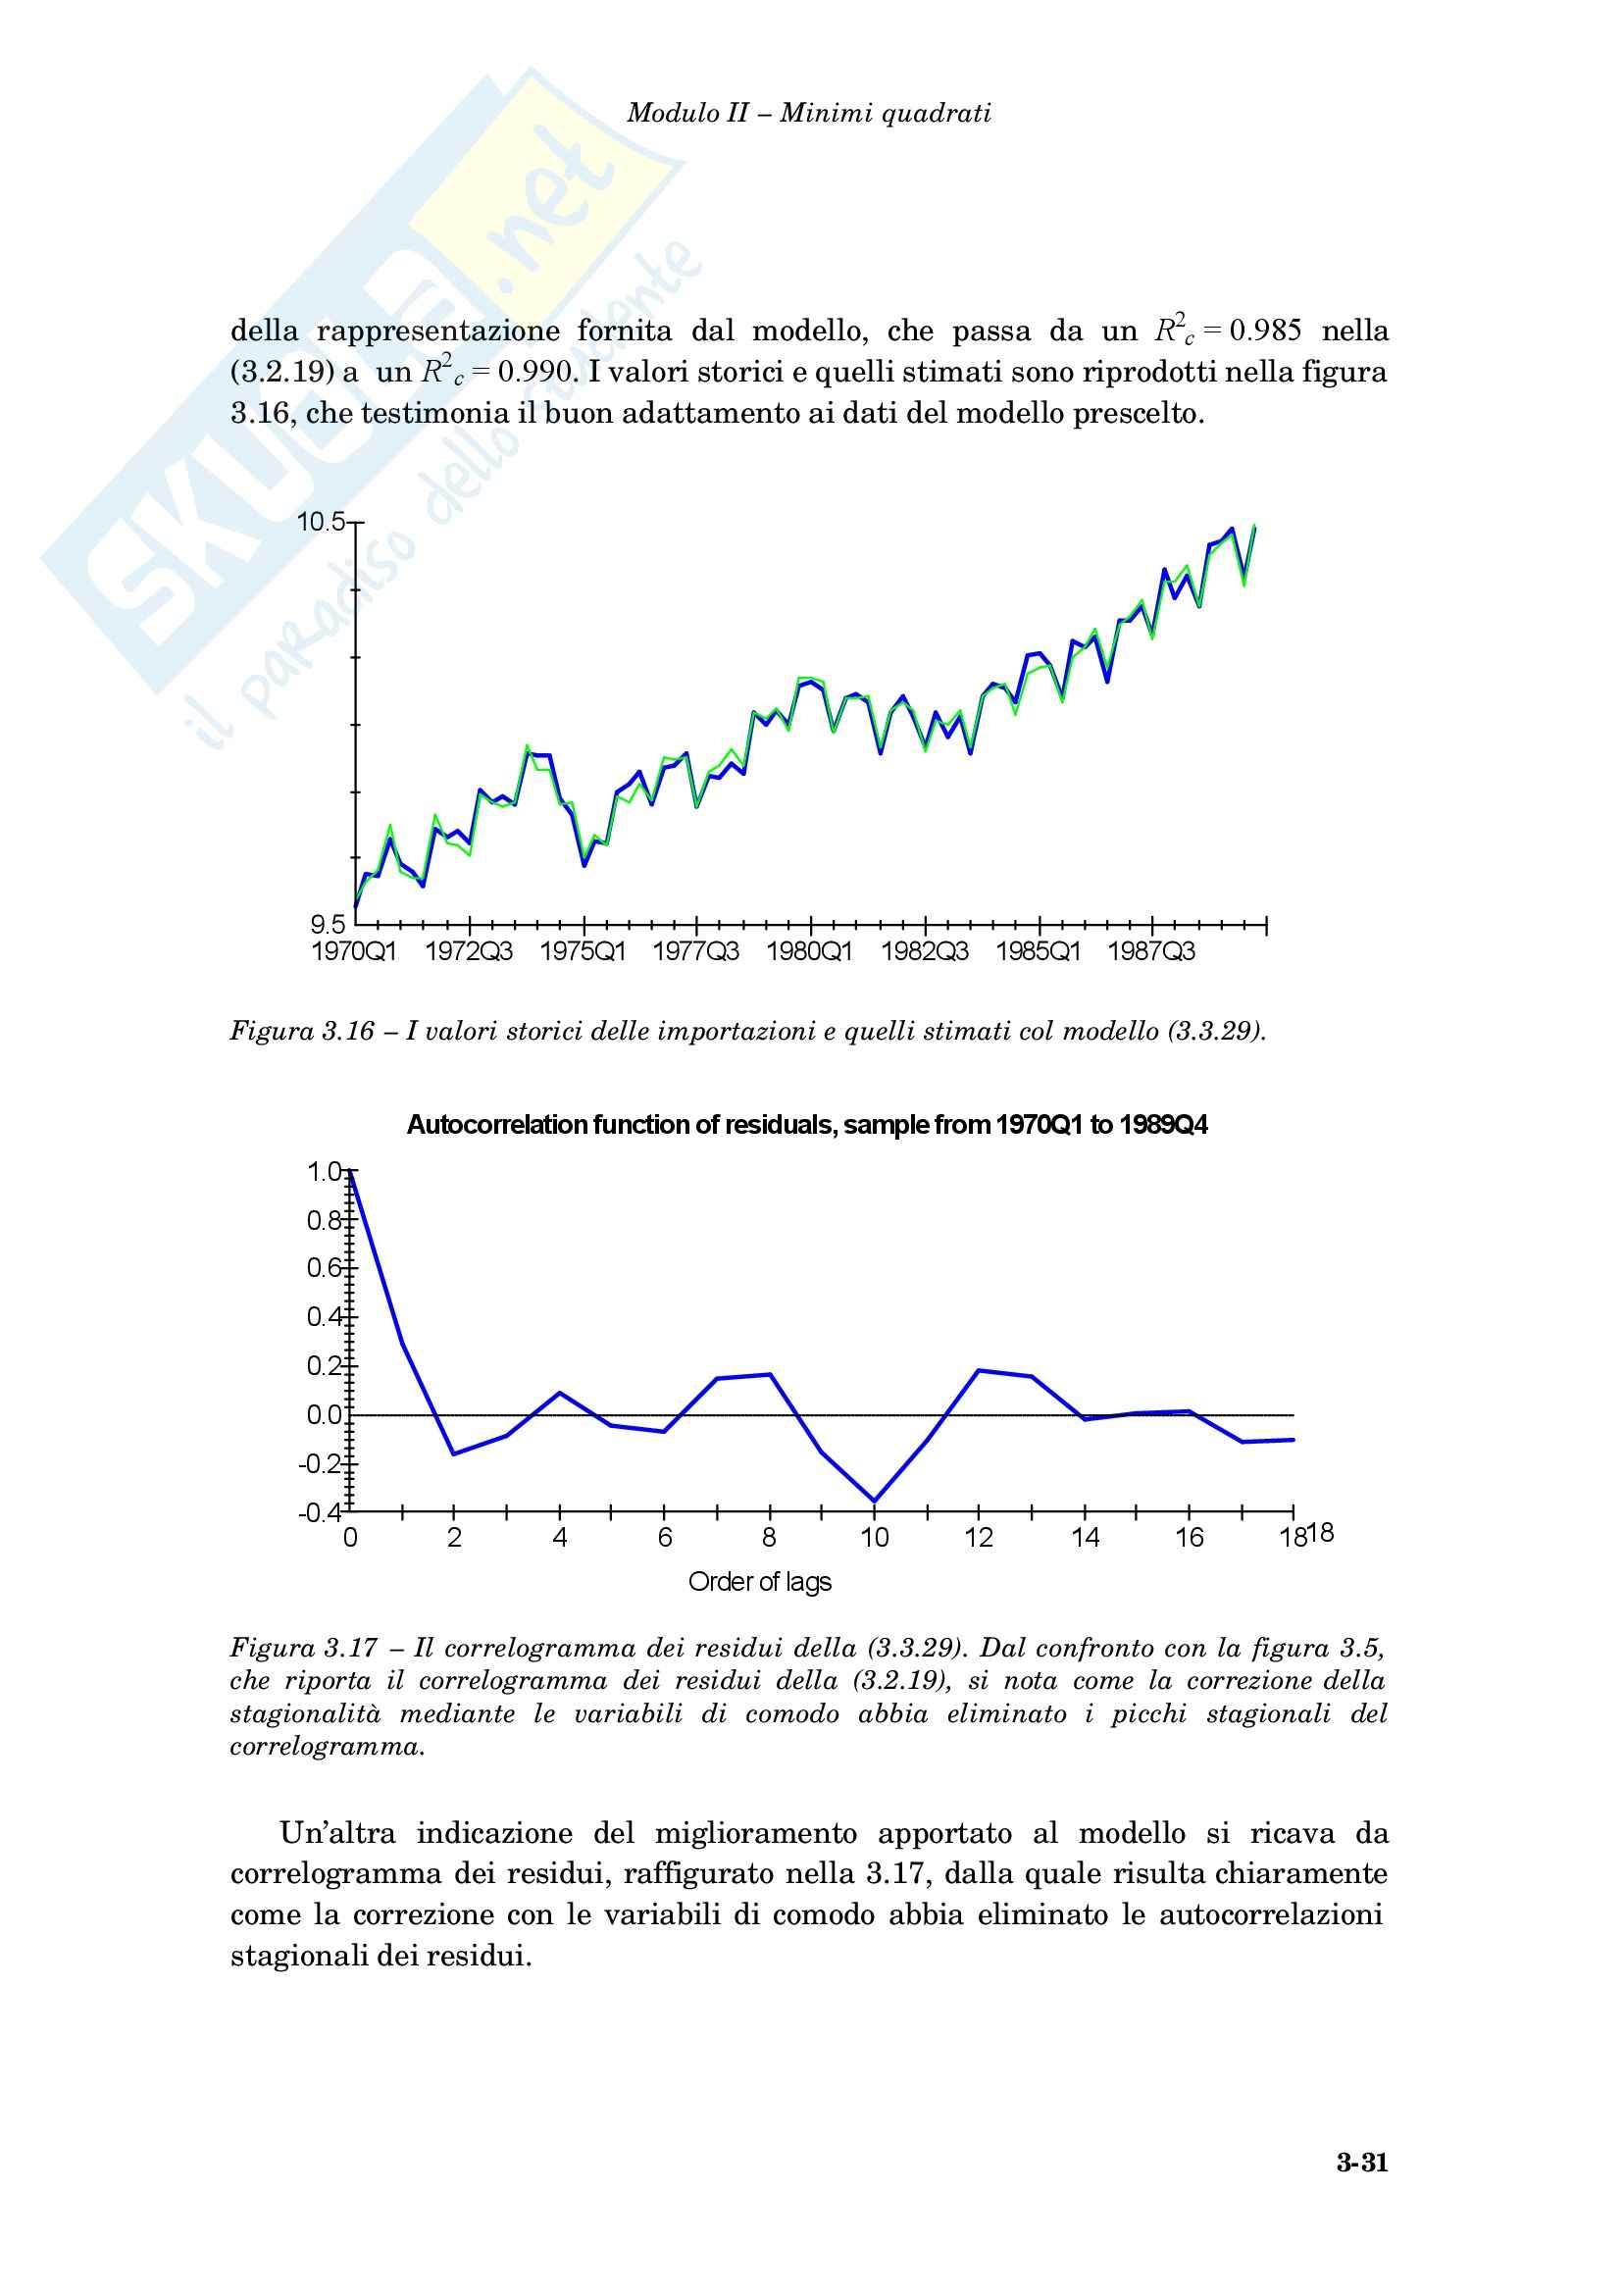 Econometria - le variabili di comodo Pag. 31